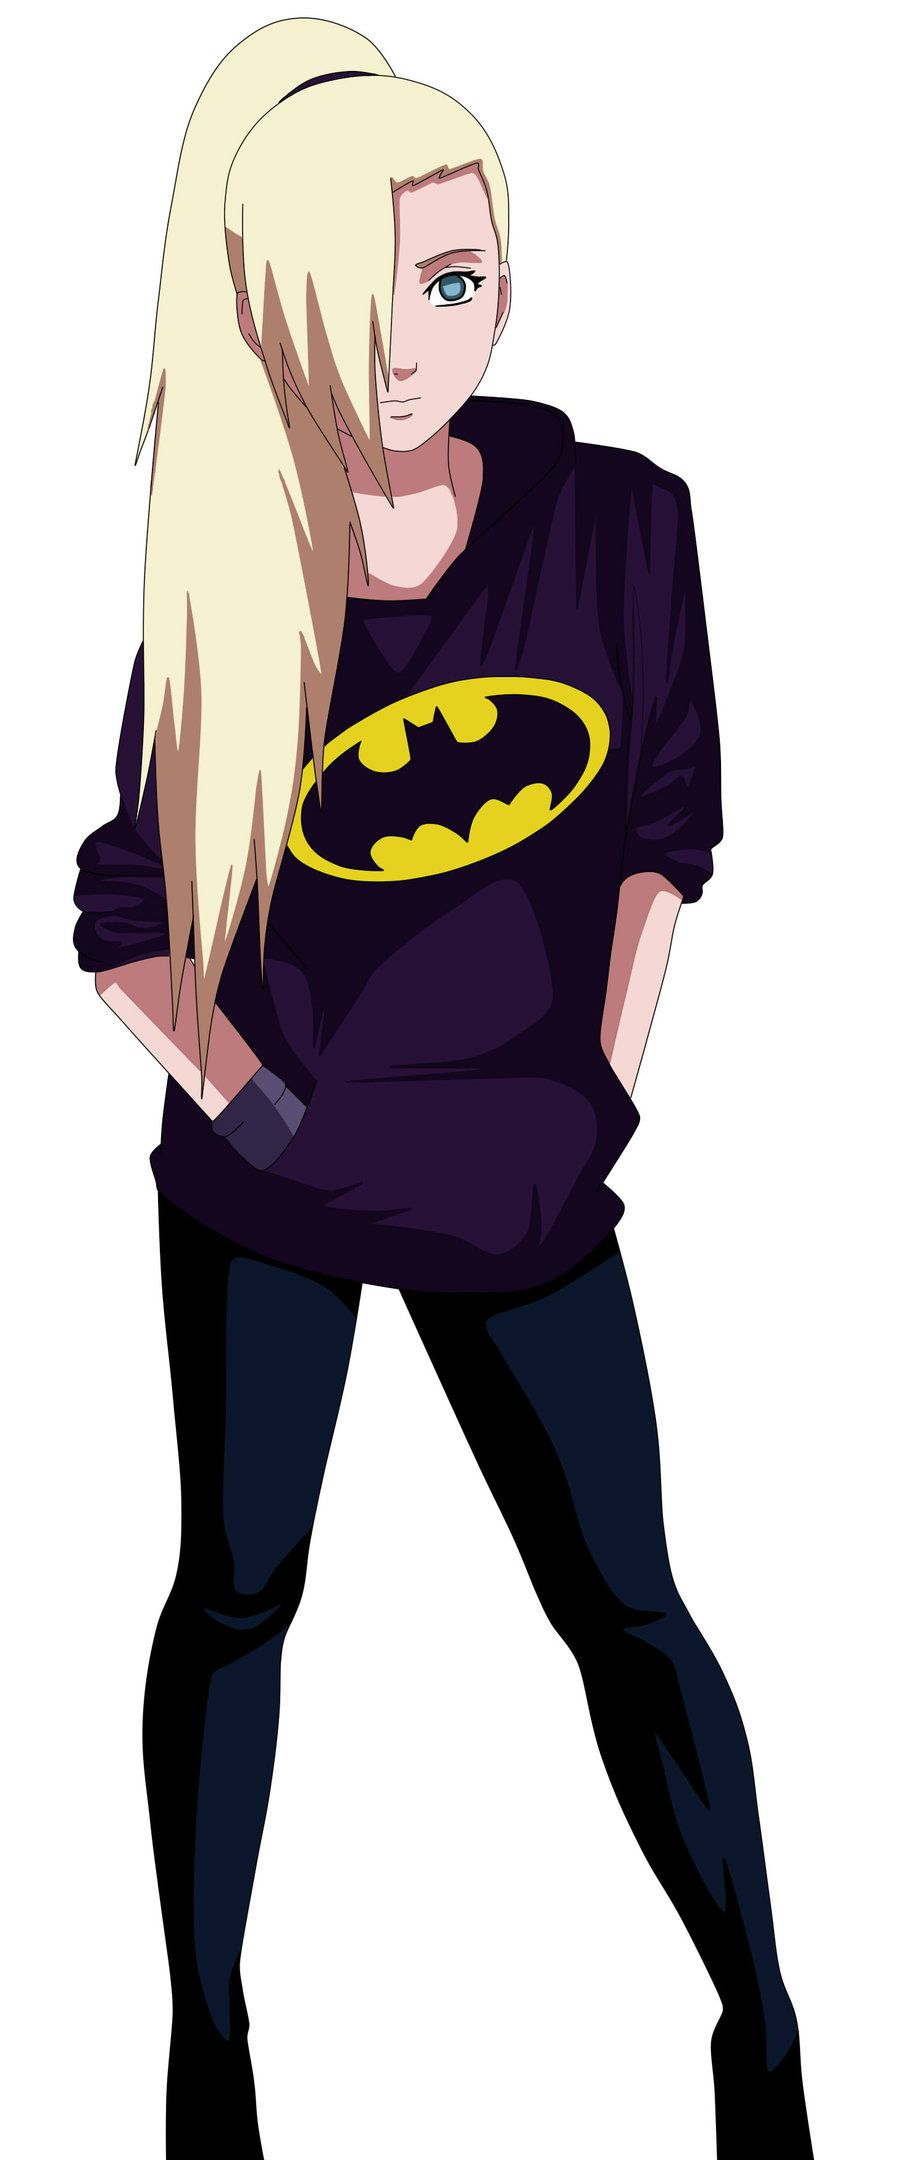 Ino Batman by kraddy07 on DeviantArt